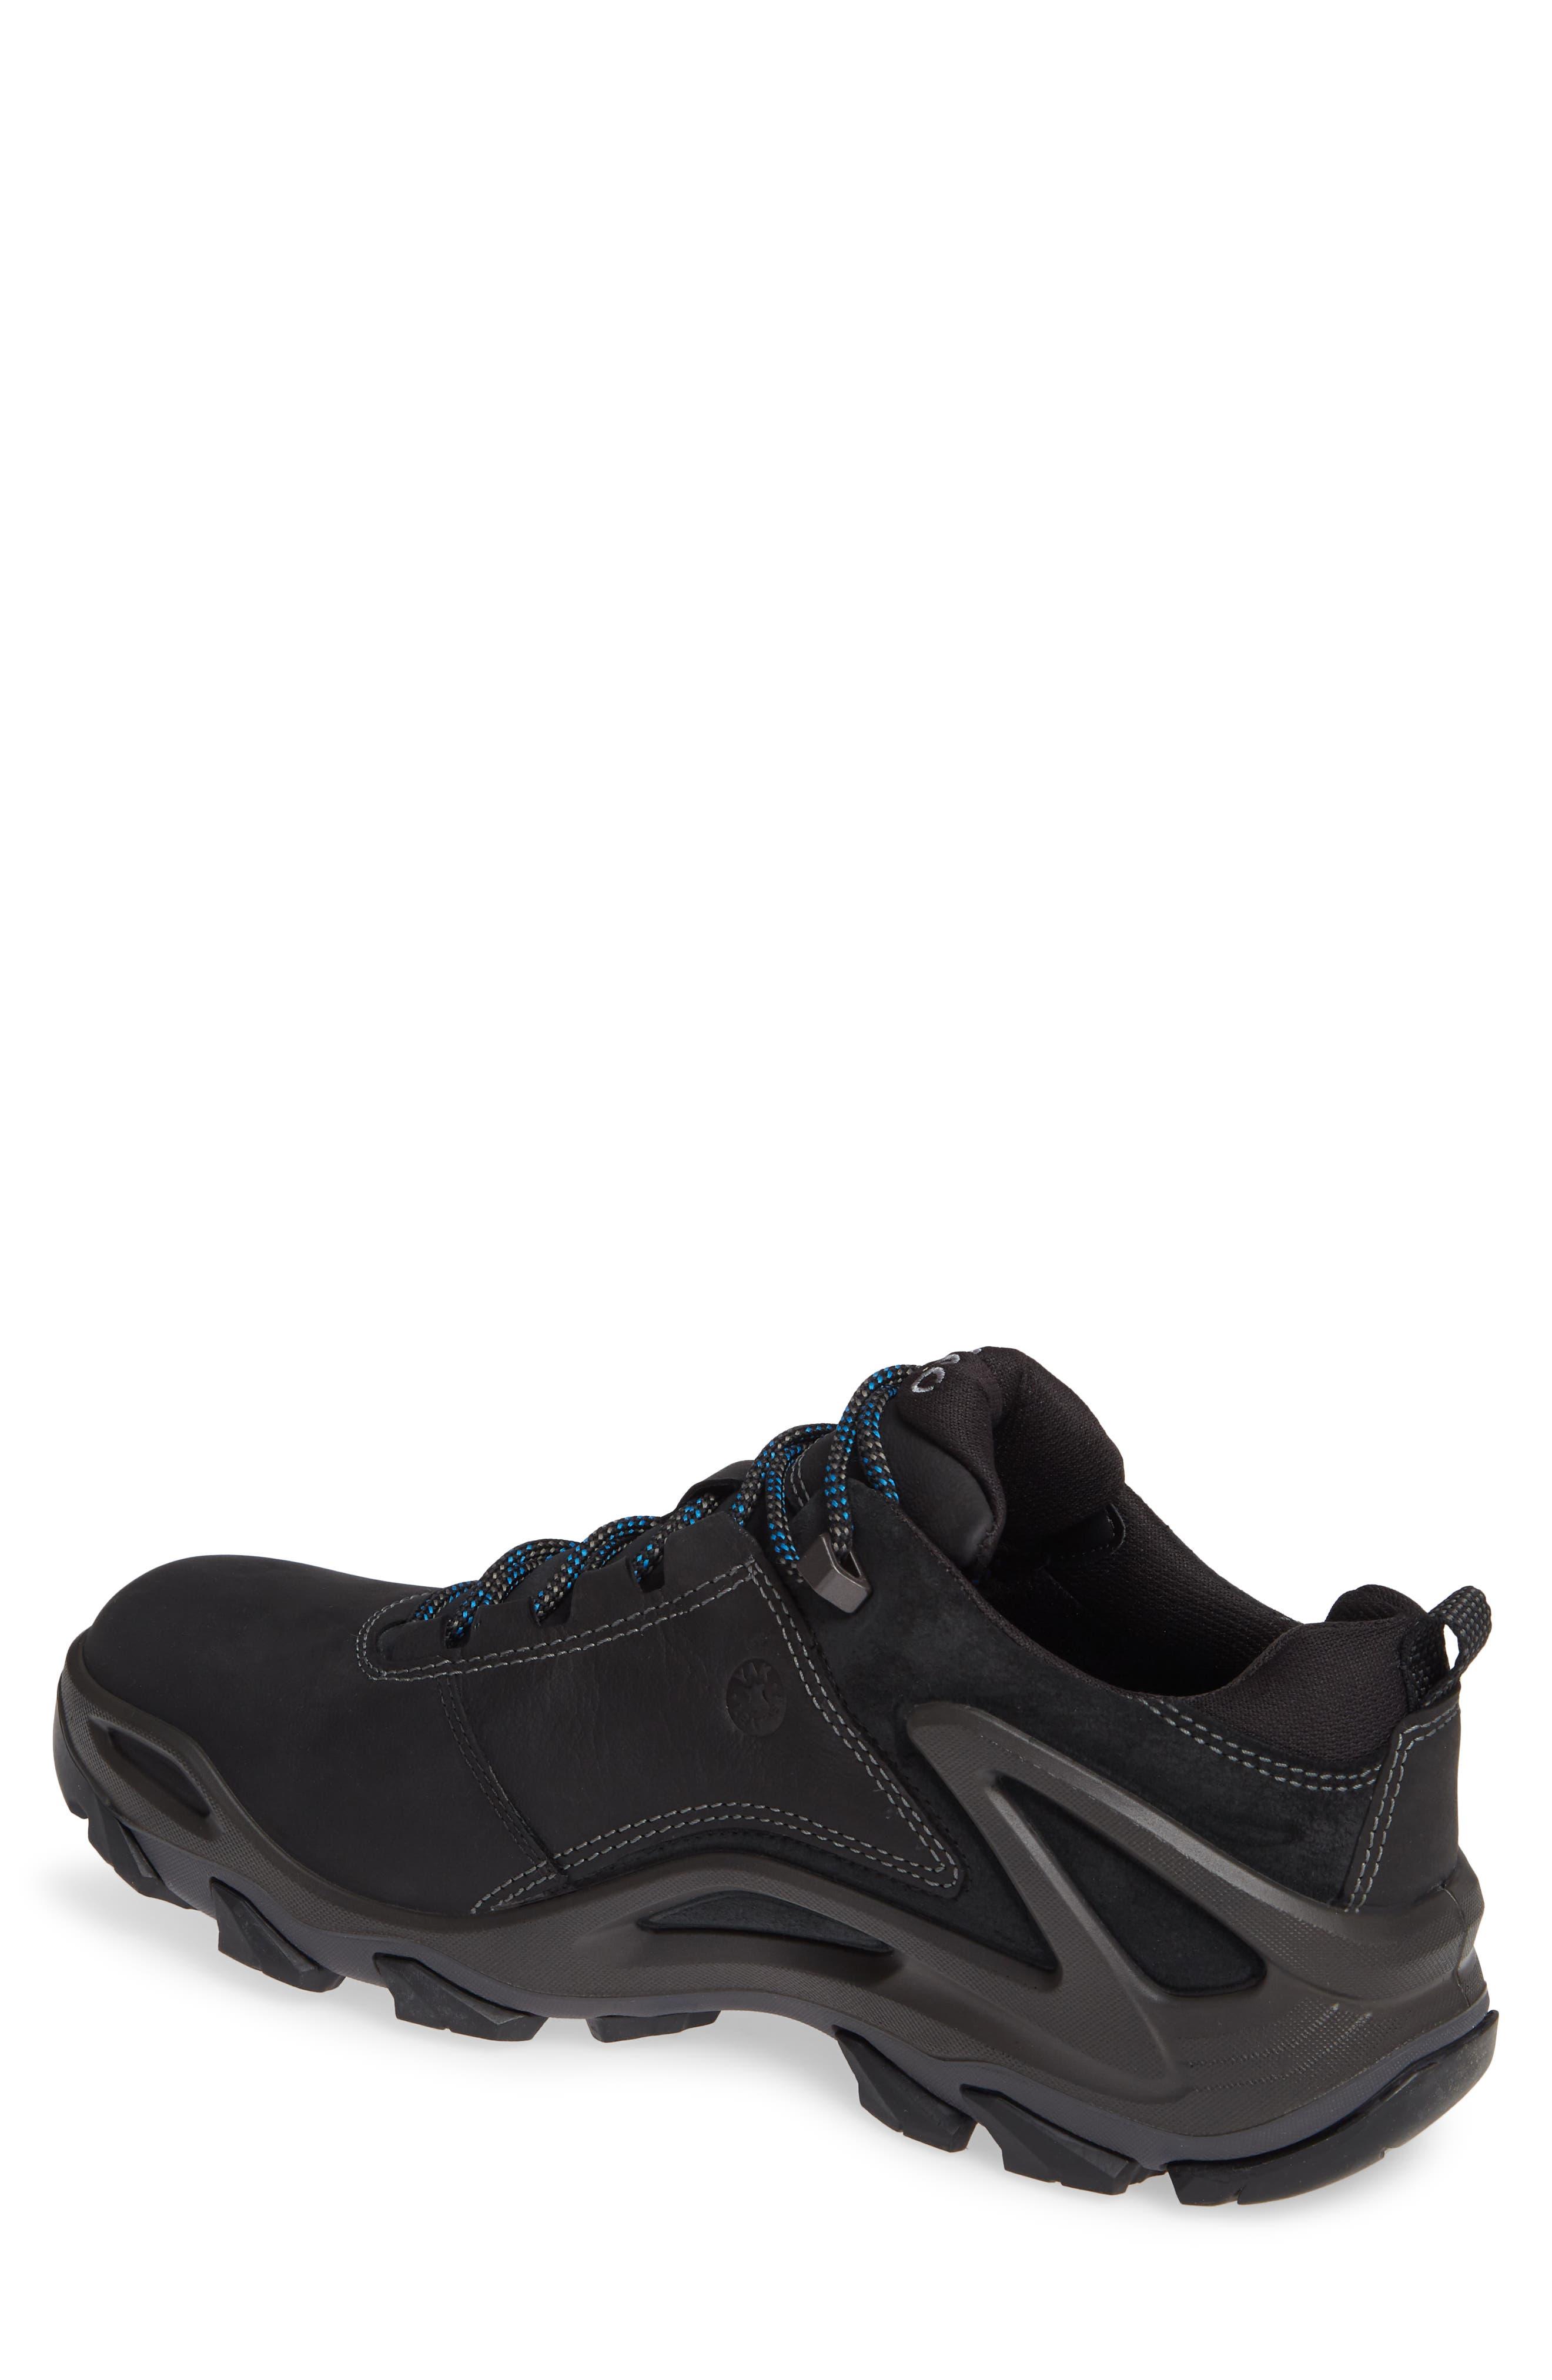 Terra Evo GTX Low Hiking Shoe,                             Alternate thumbnail 2, color,                             009